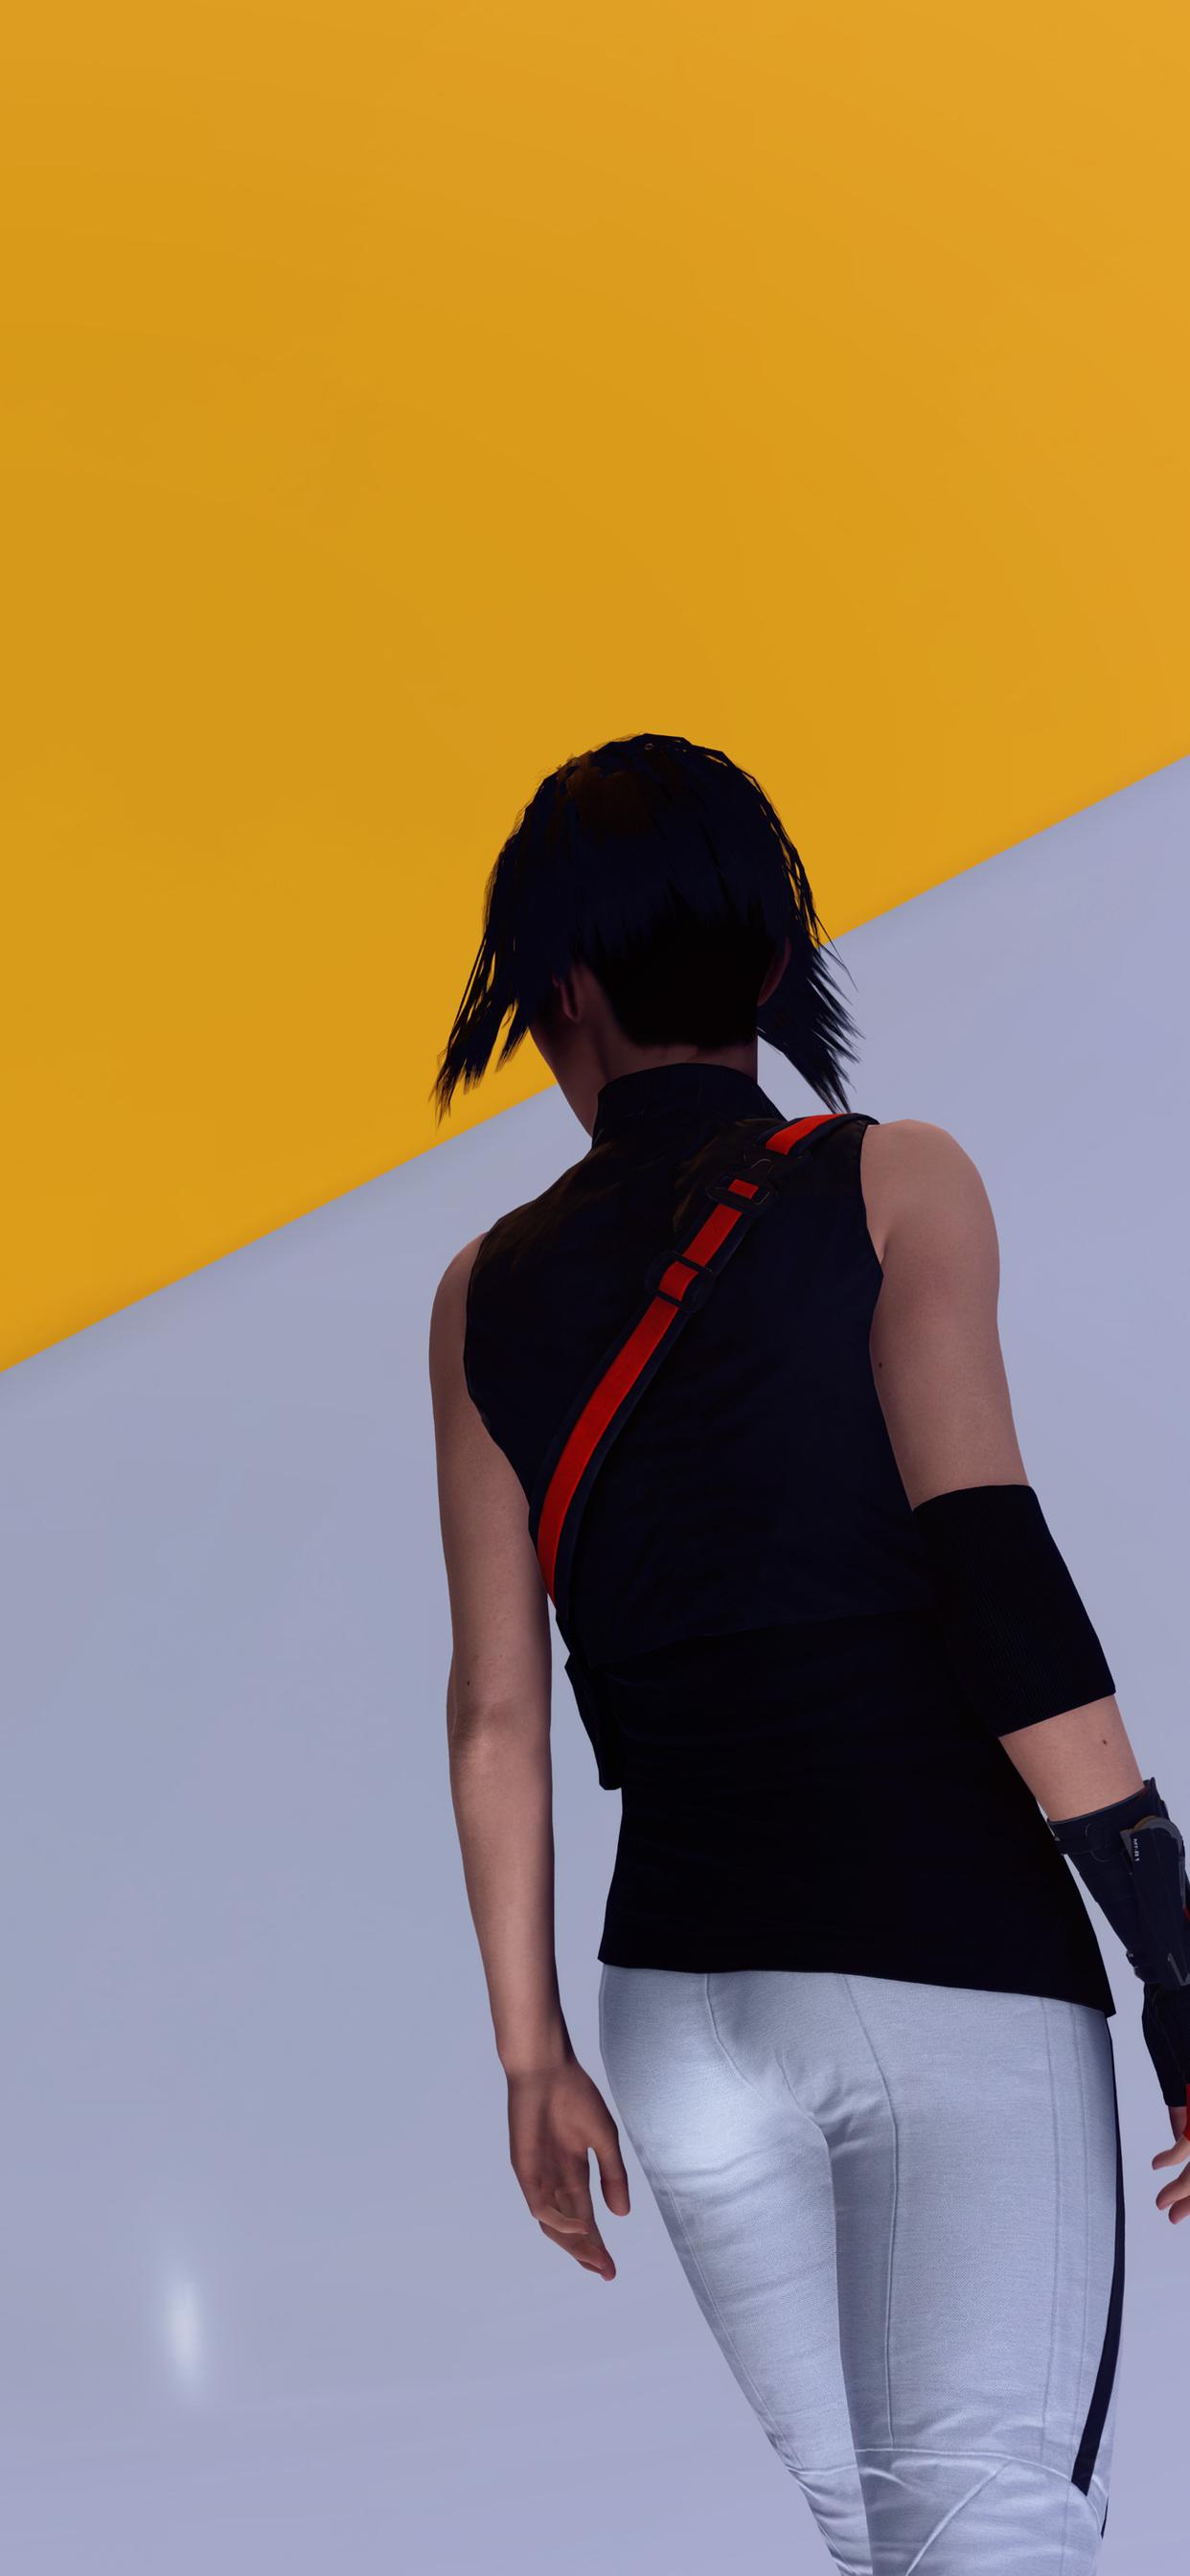 mirrors-edge-catalyst-game-2018-4k-d3.jpg